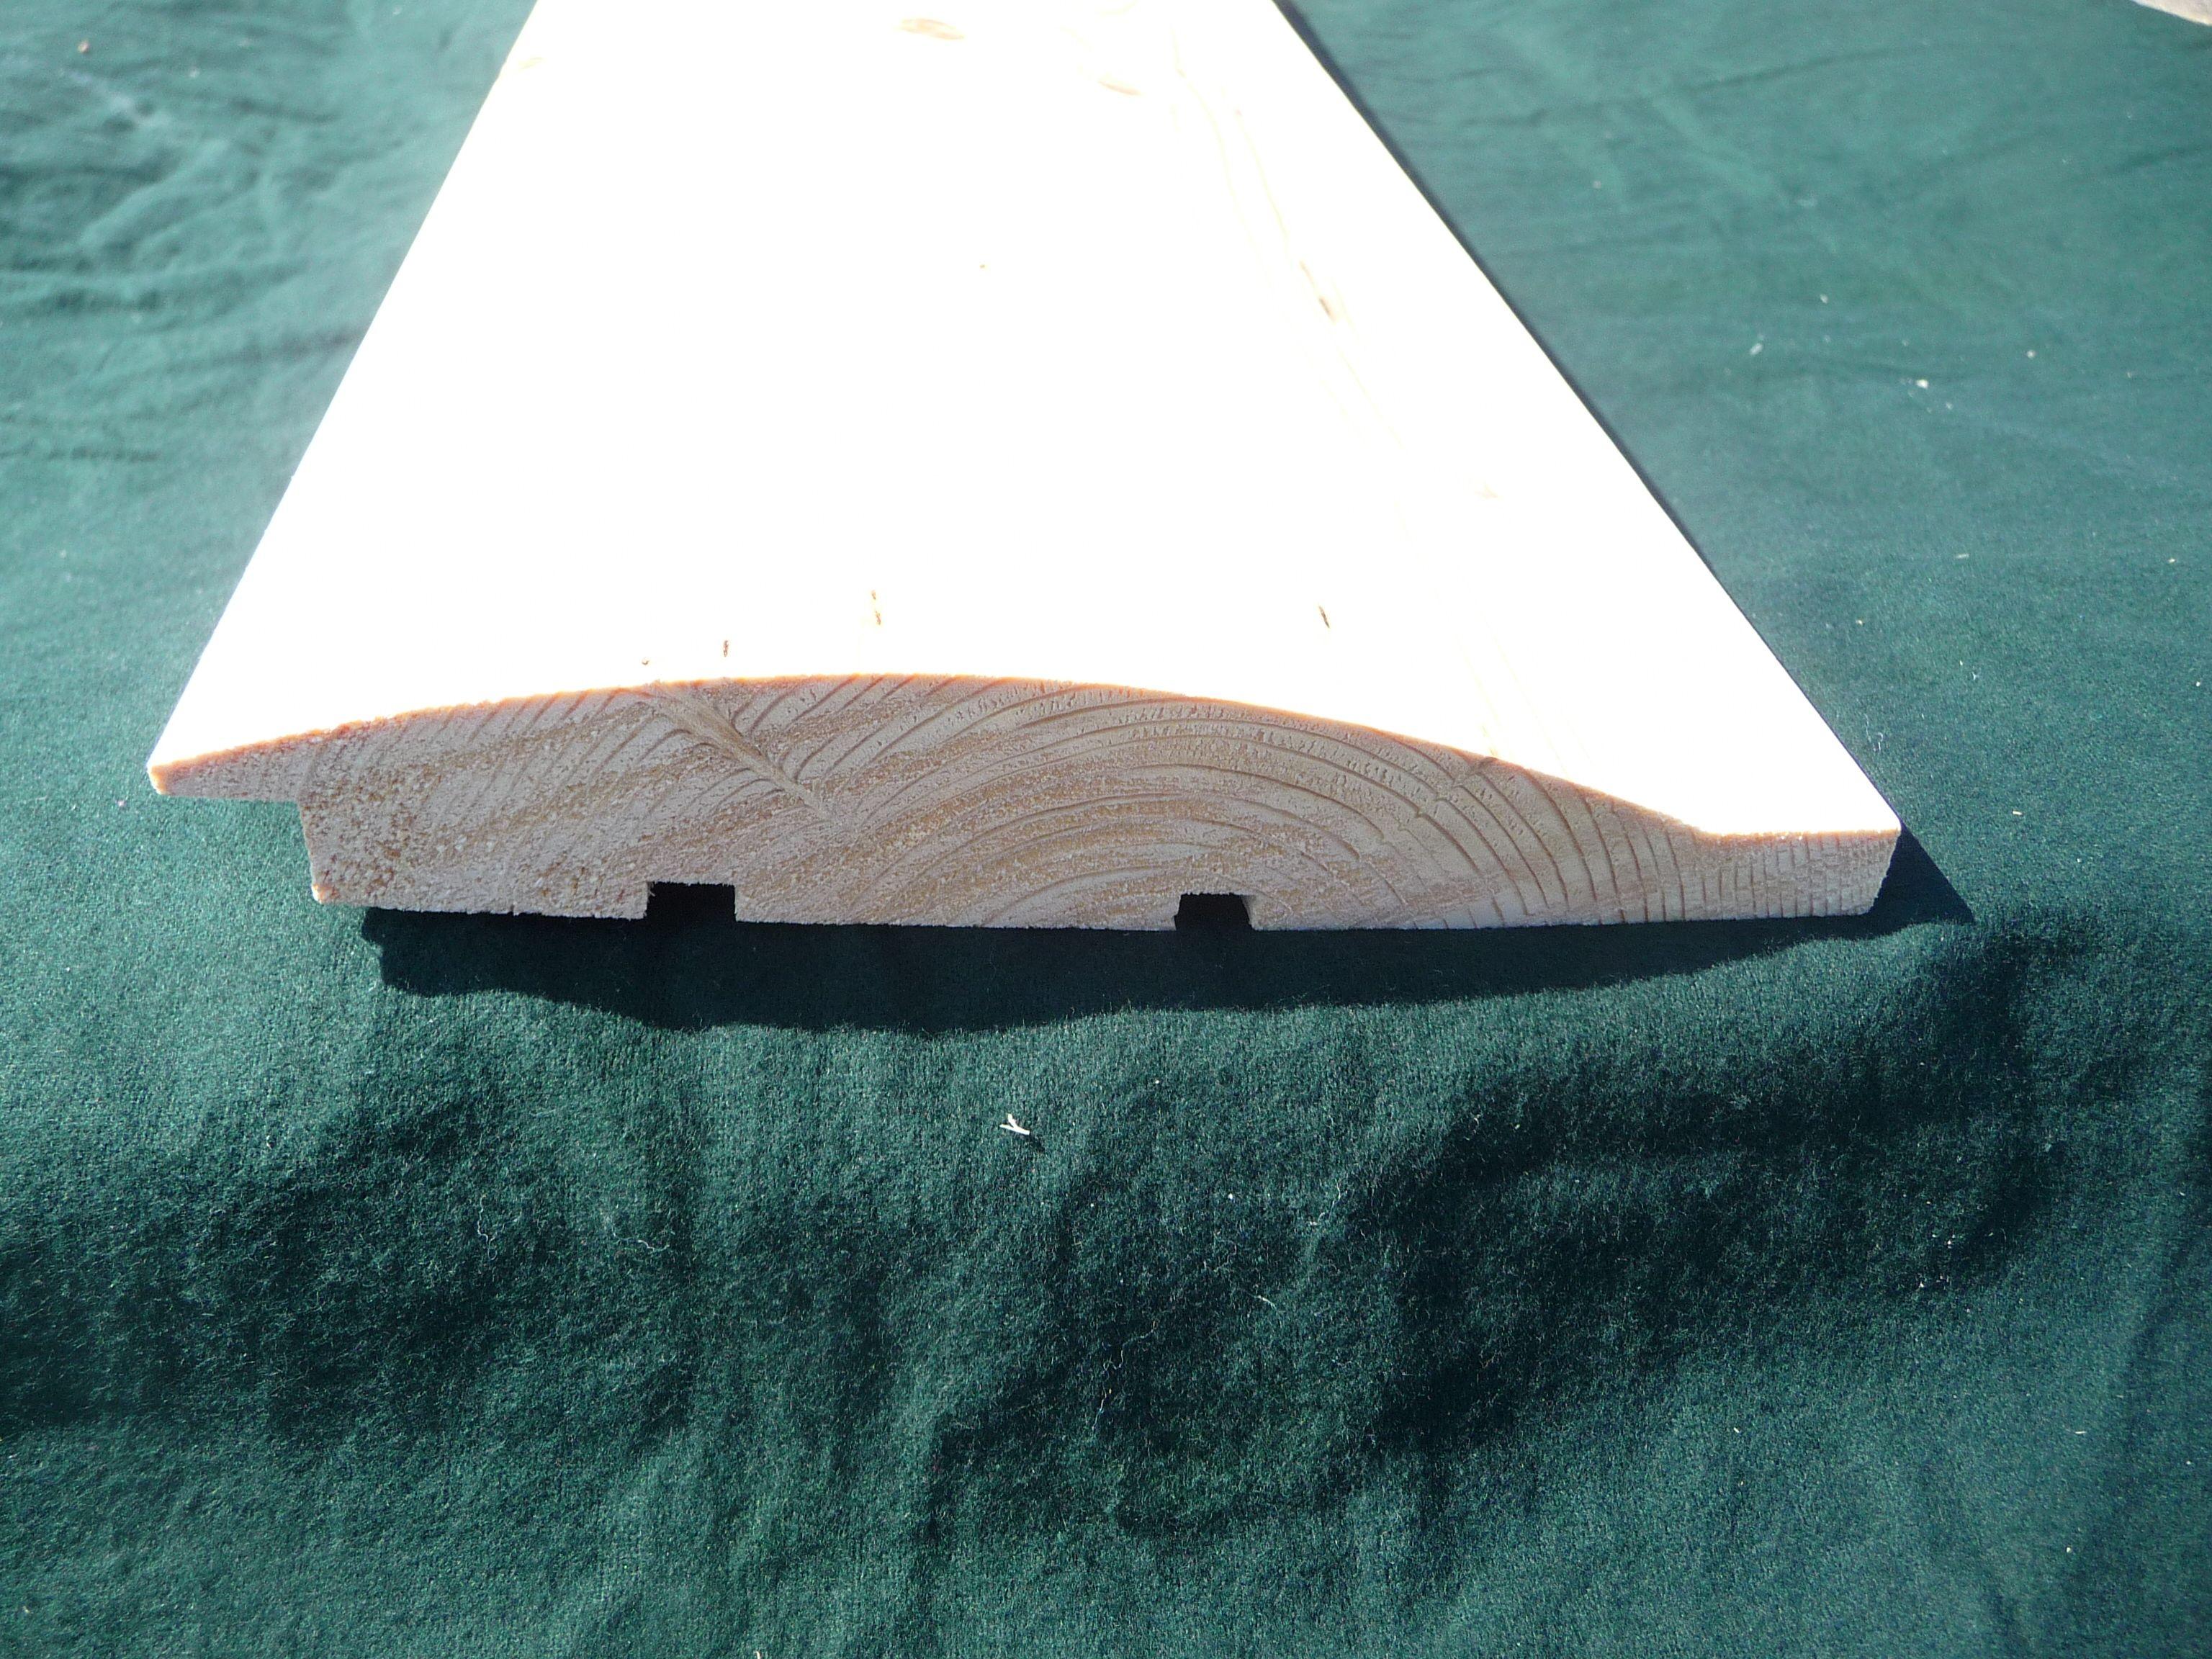 3x8 log siding hand hewn pine - 3x8 Log Siding Hand Hewn Pine 54